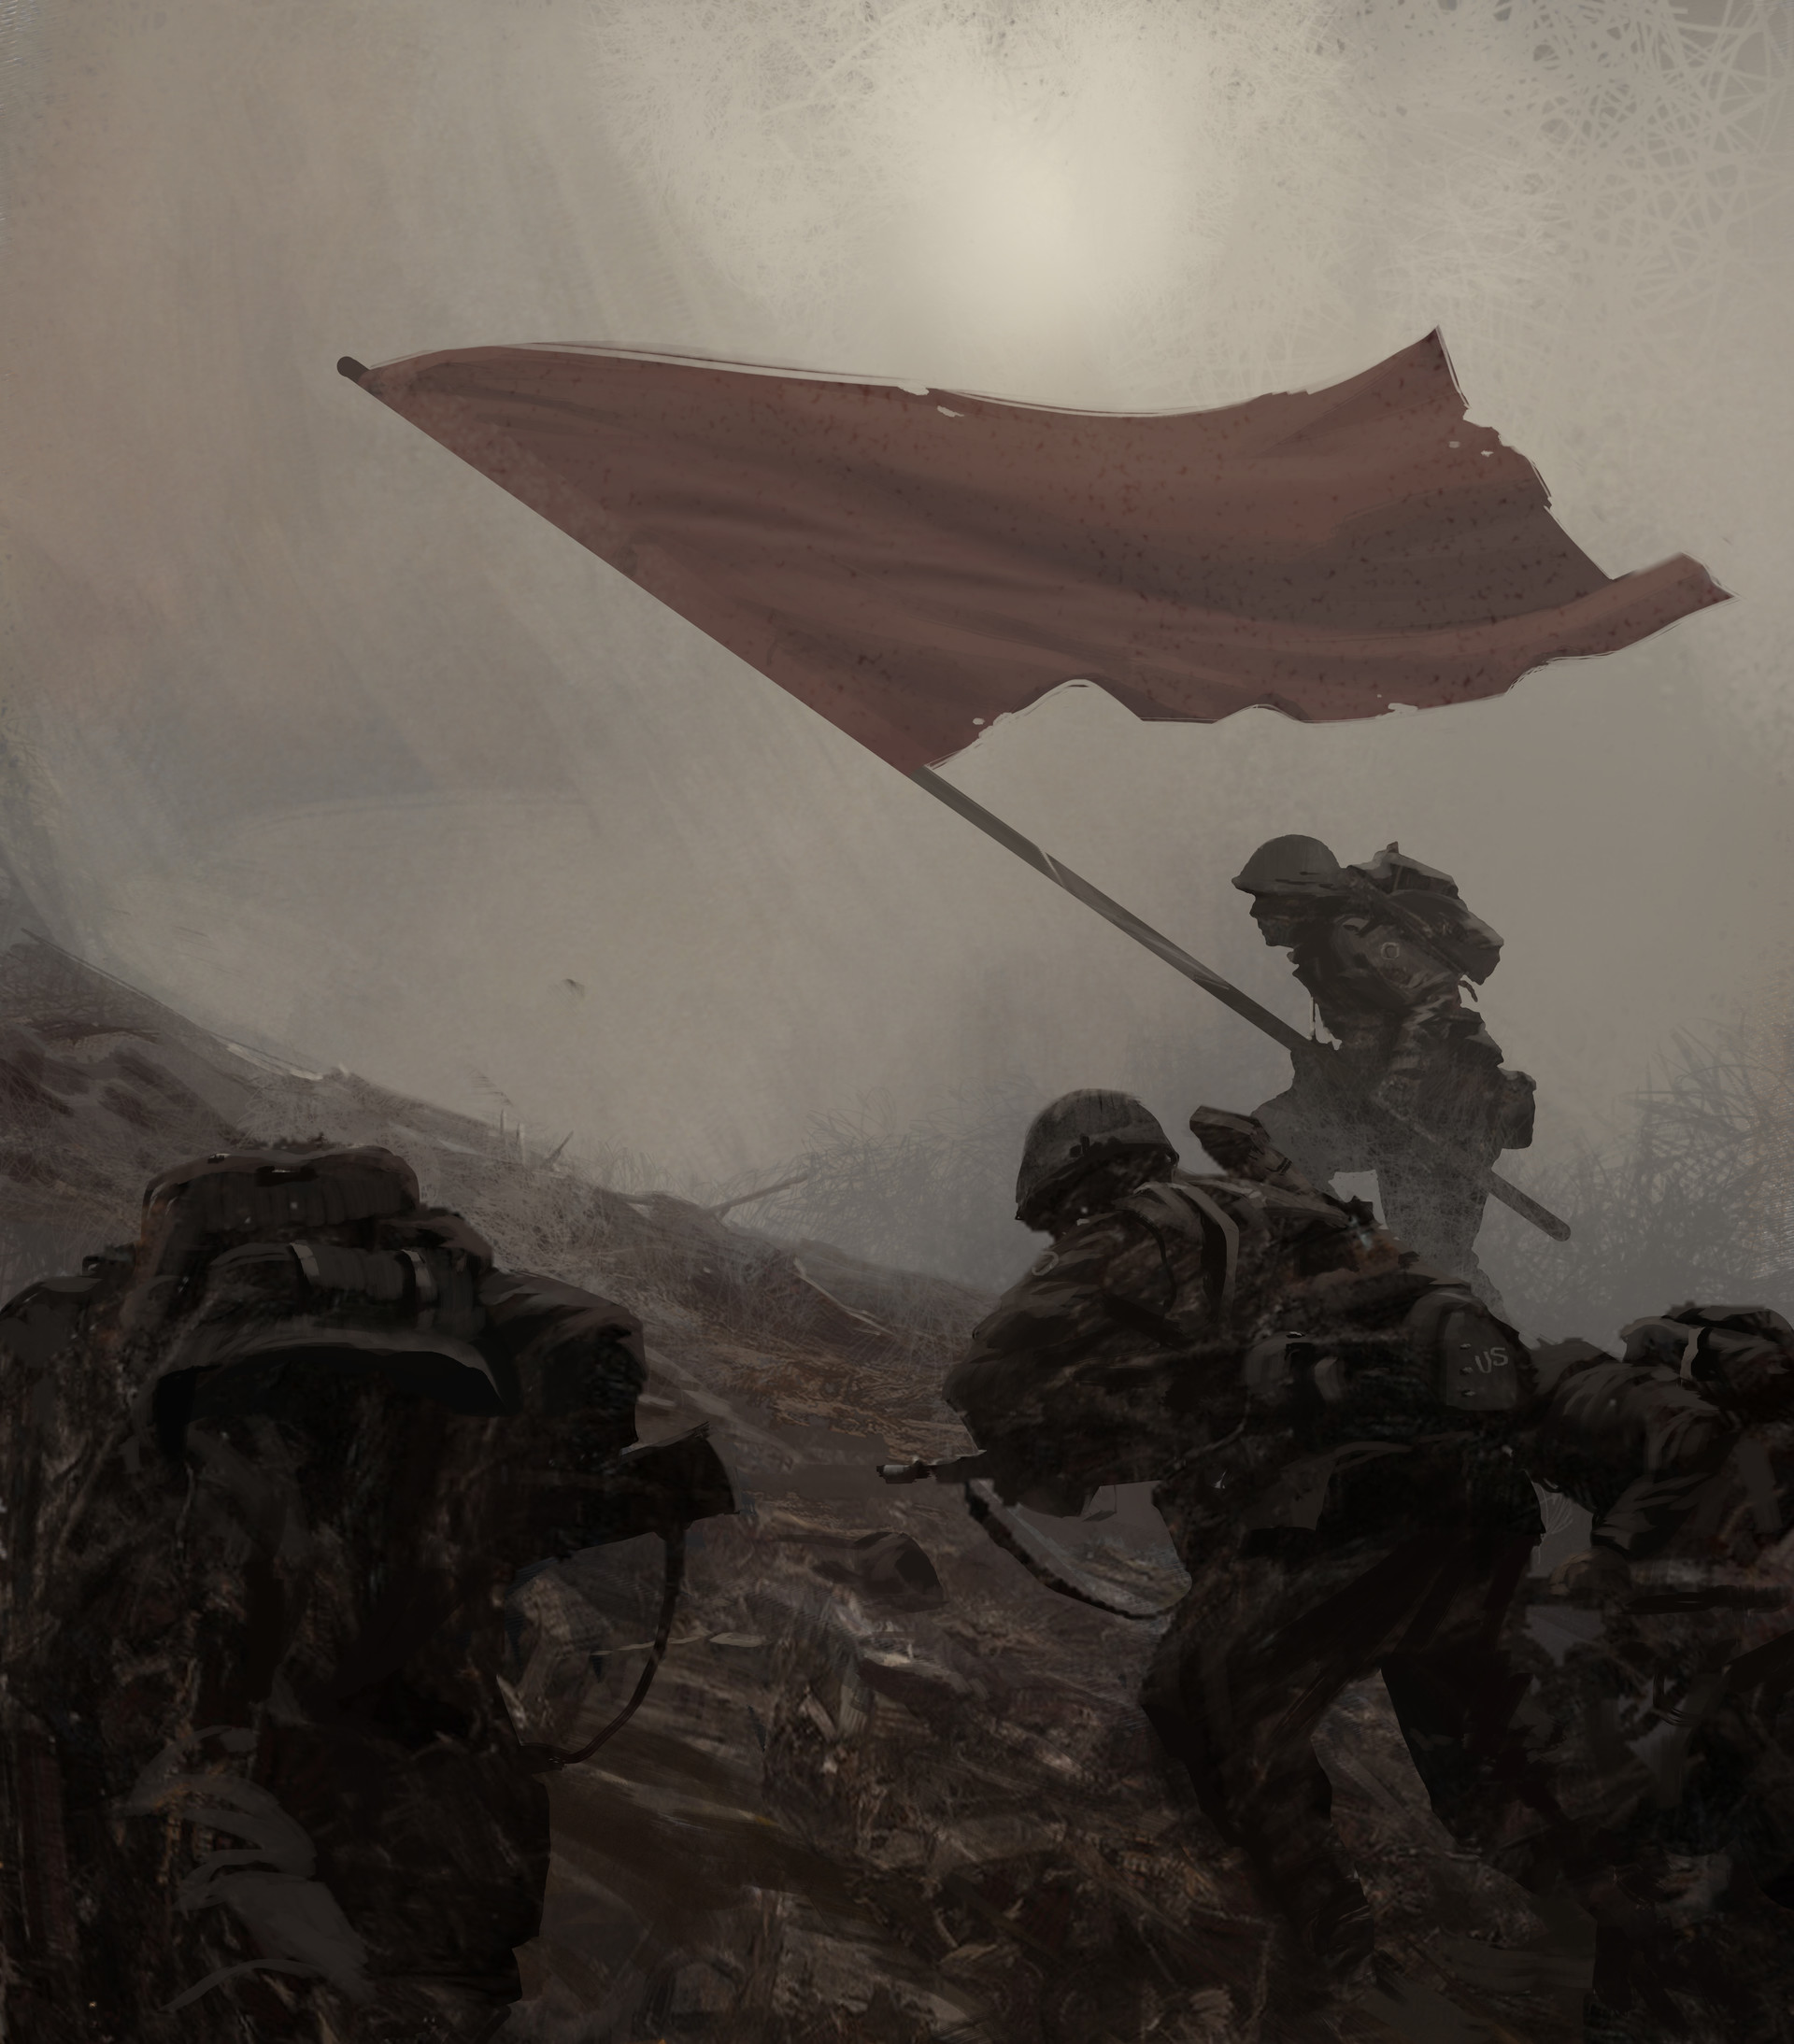 james-paick-ww2-soldiers-054-copy.jpg